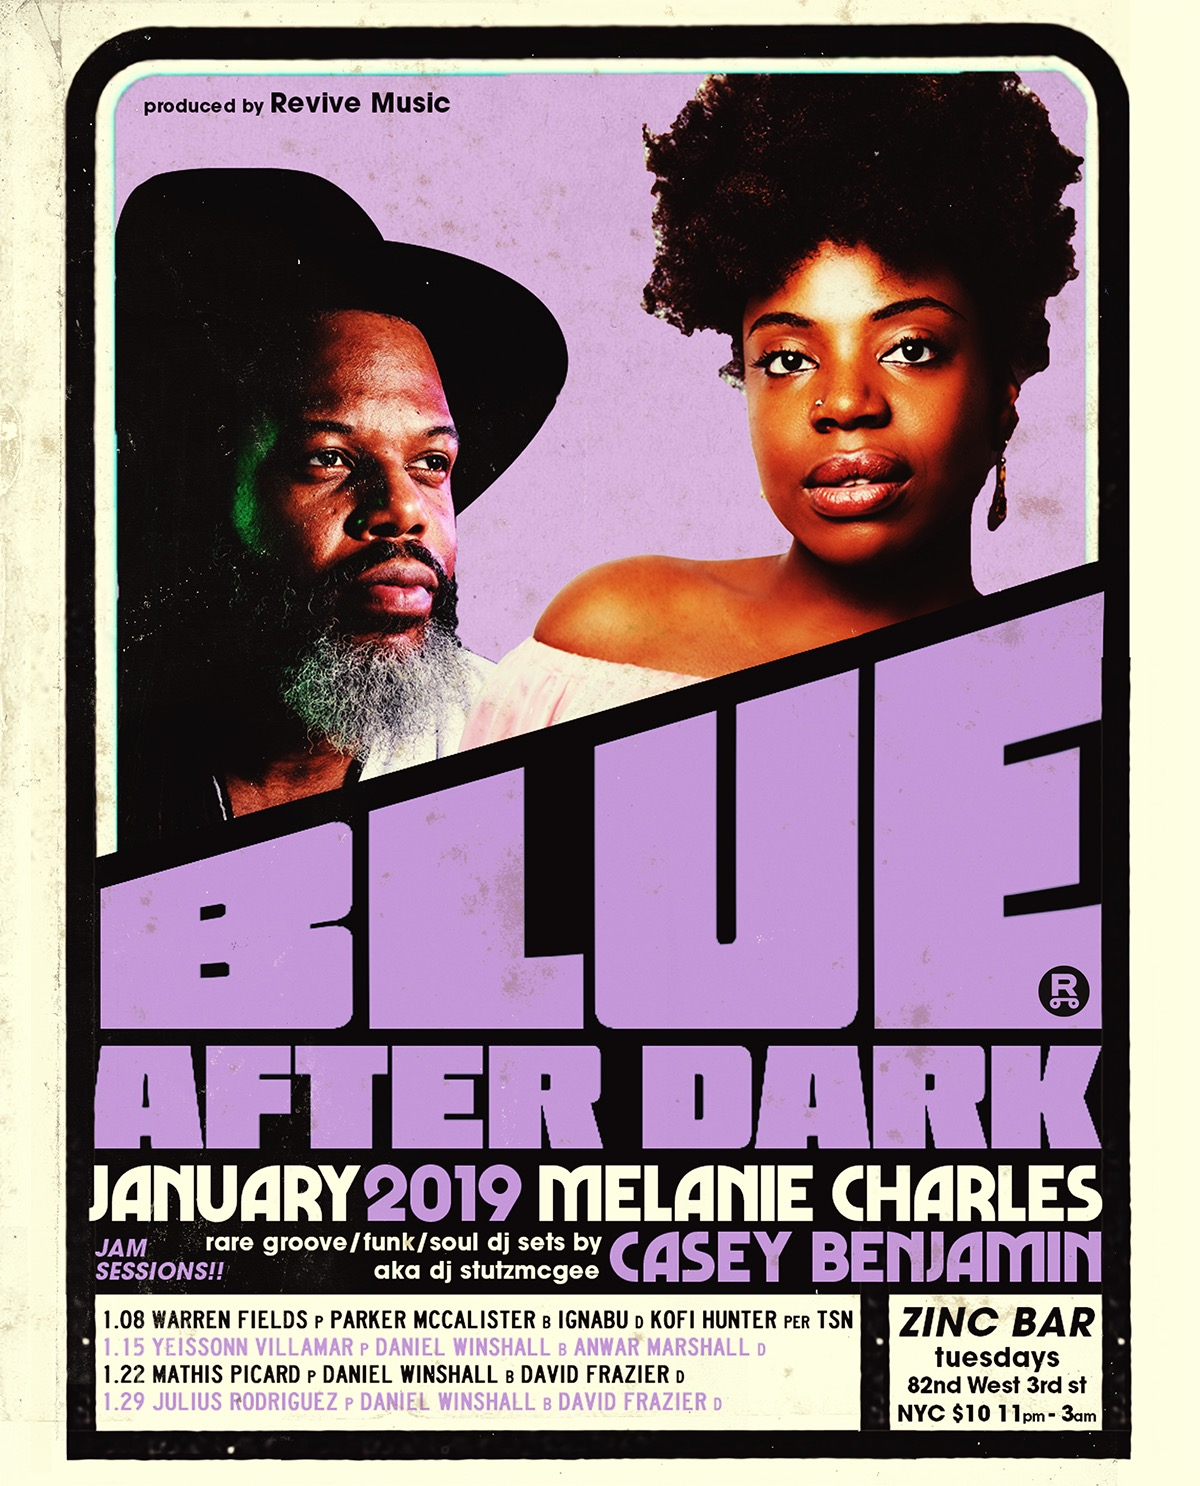 REVIVE Music Announces Blue After Dark's New Host Melanie Charles + Resident DJ Casey Benjamin aka DJ Stutzmcgee